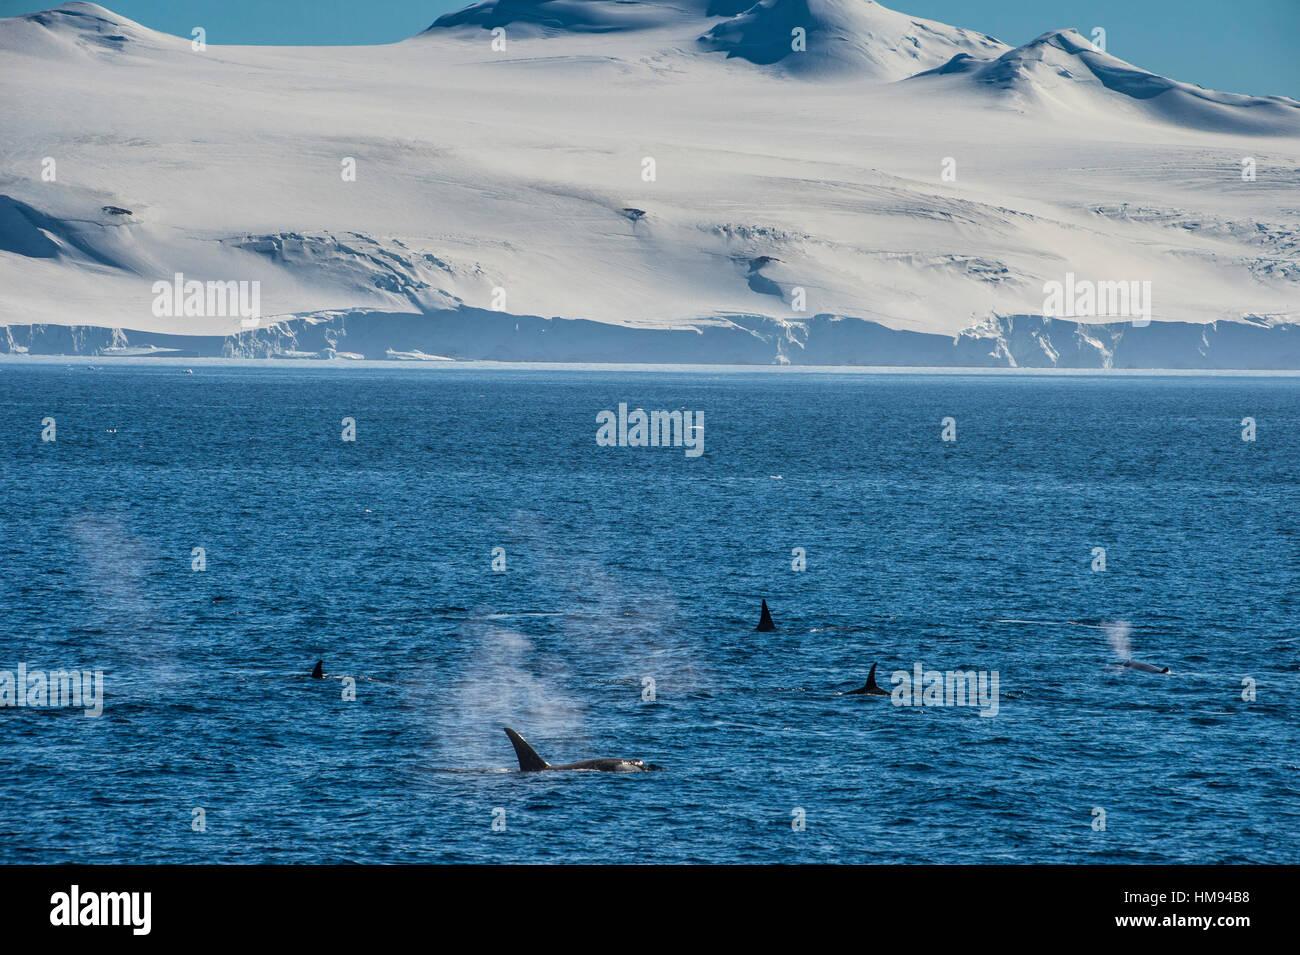 Killer whales (orcas) (Orcinus orca) hunting, Weddell, Sea, Antarctica, Polar Regions - Stock Image